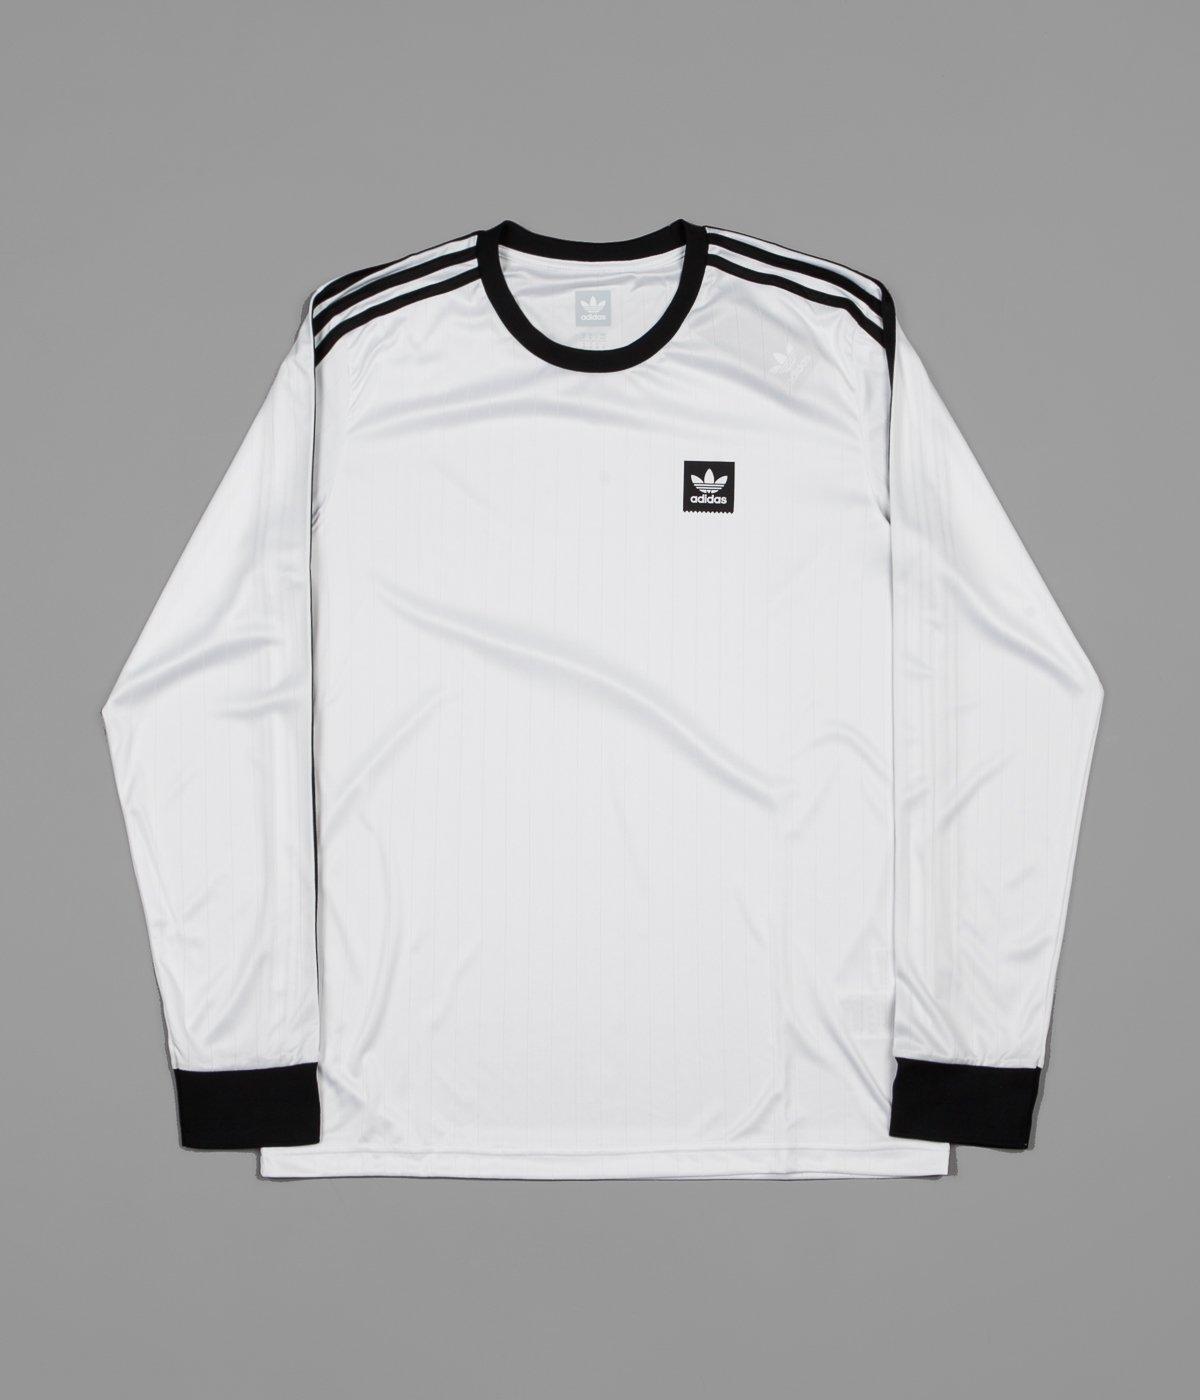 brand new 39f1c d3673 Very Goods   Adidas Club Long Sleeve Jersey - White   Black   Flatspot